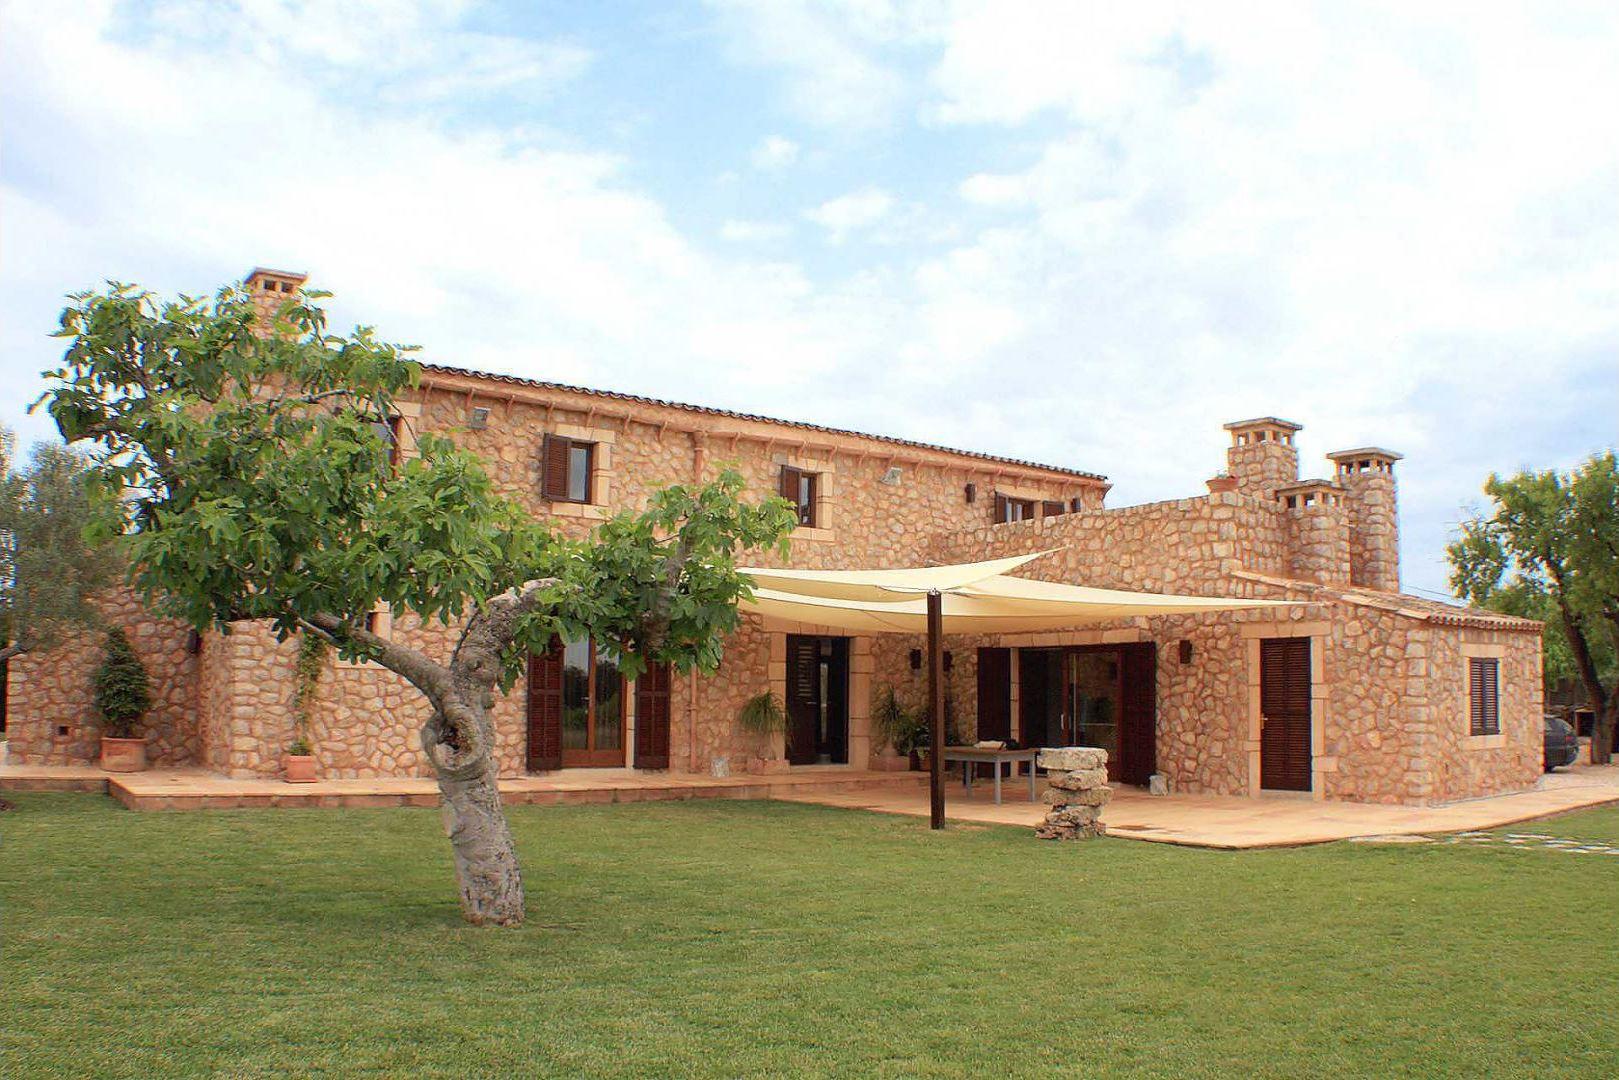 Moderne Finca Mallorca : moderne finca mallorca nordosten in arta luxus feriendomizile ~ Sanjose-hotels-ca.com Haus und Dekorationen